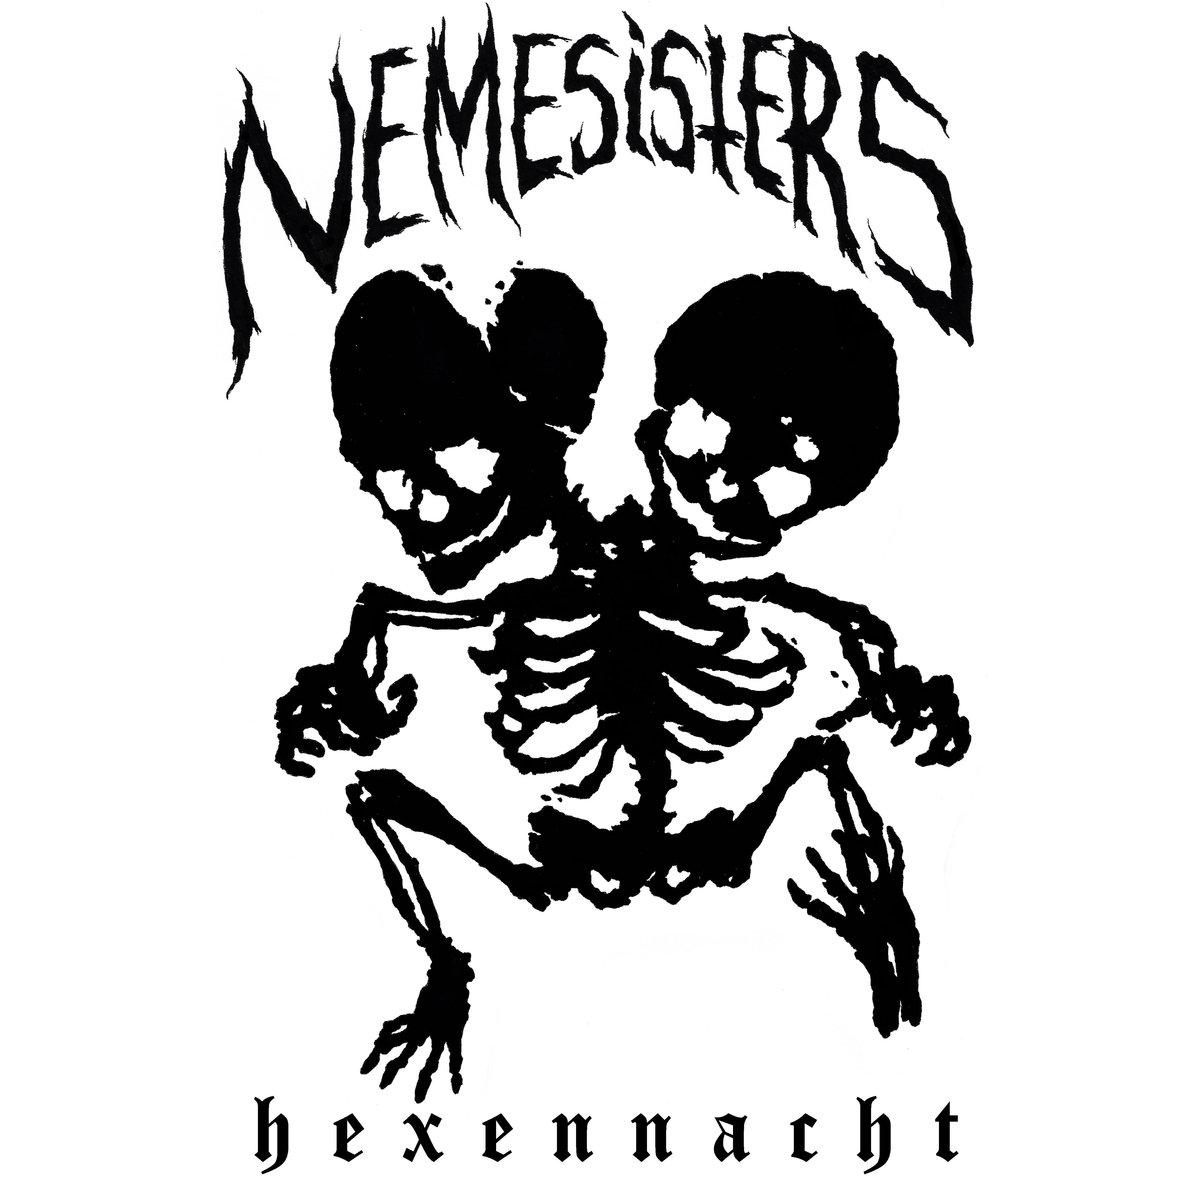 Nemesisters • Hexennacht